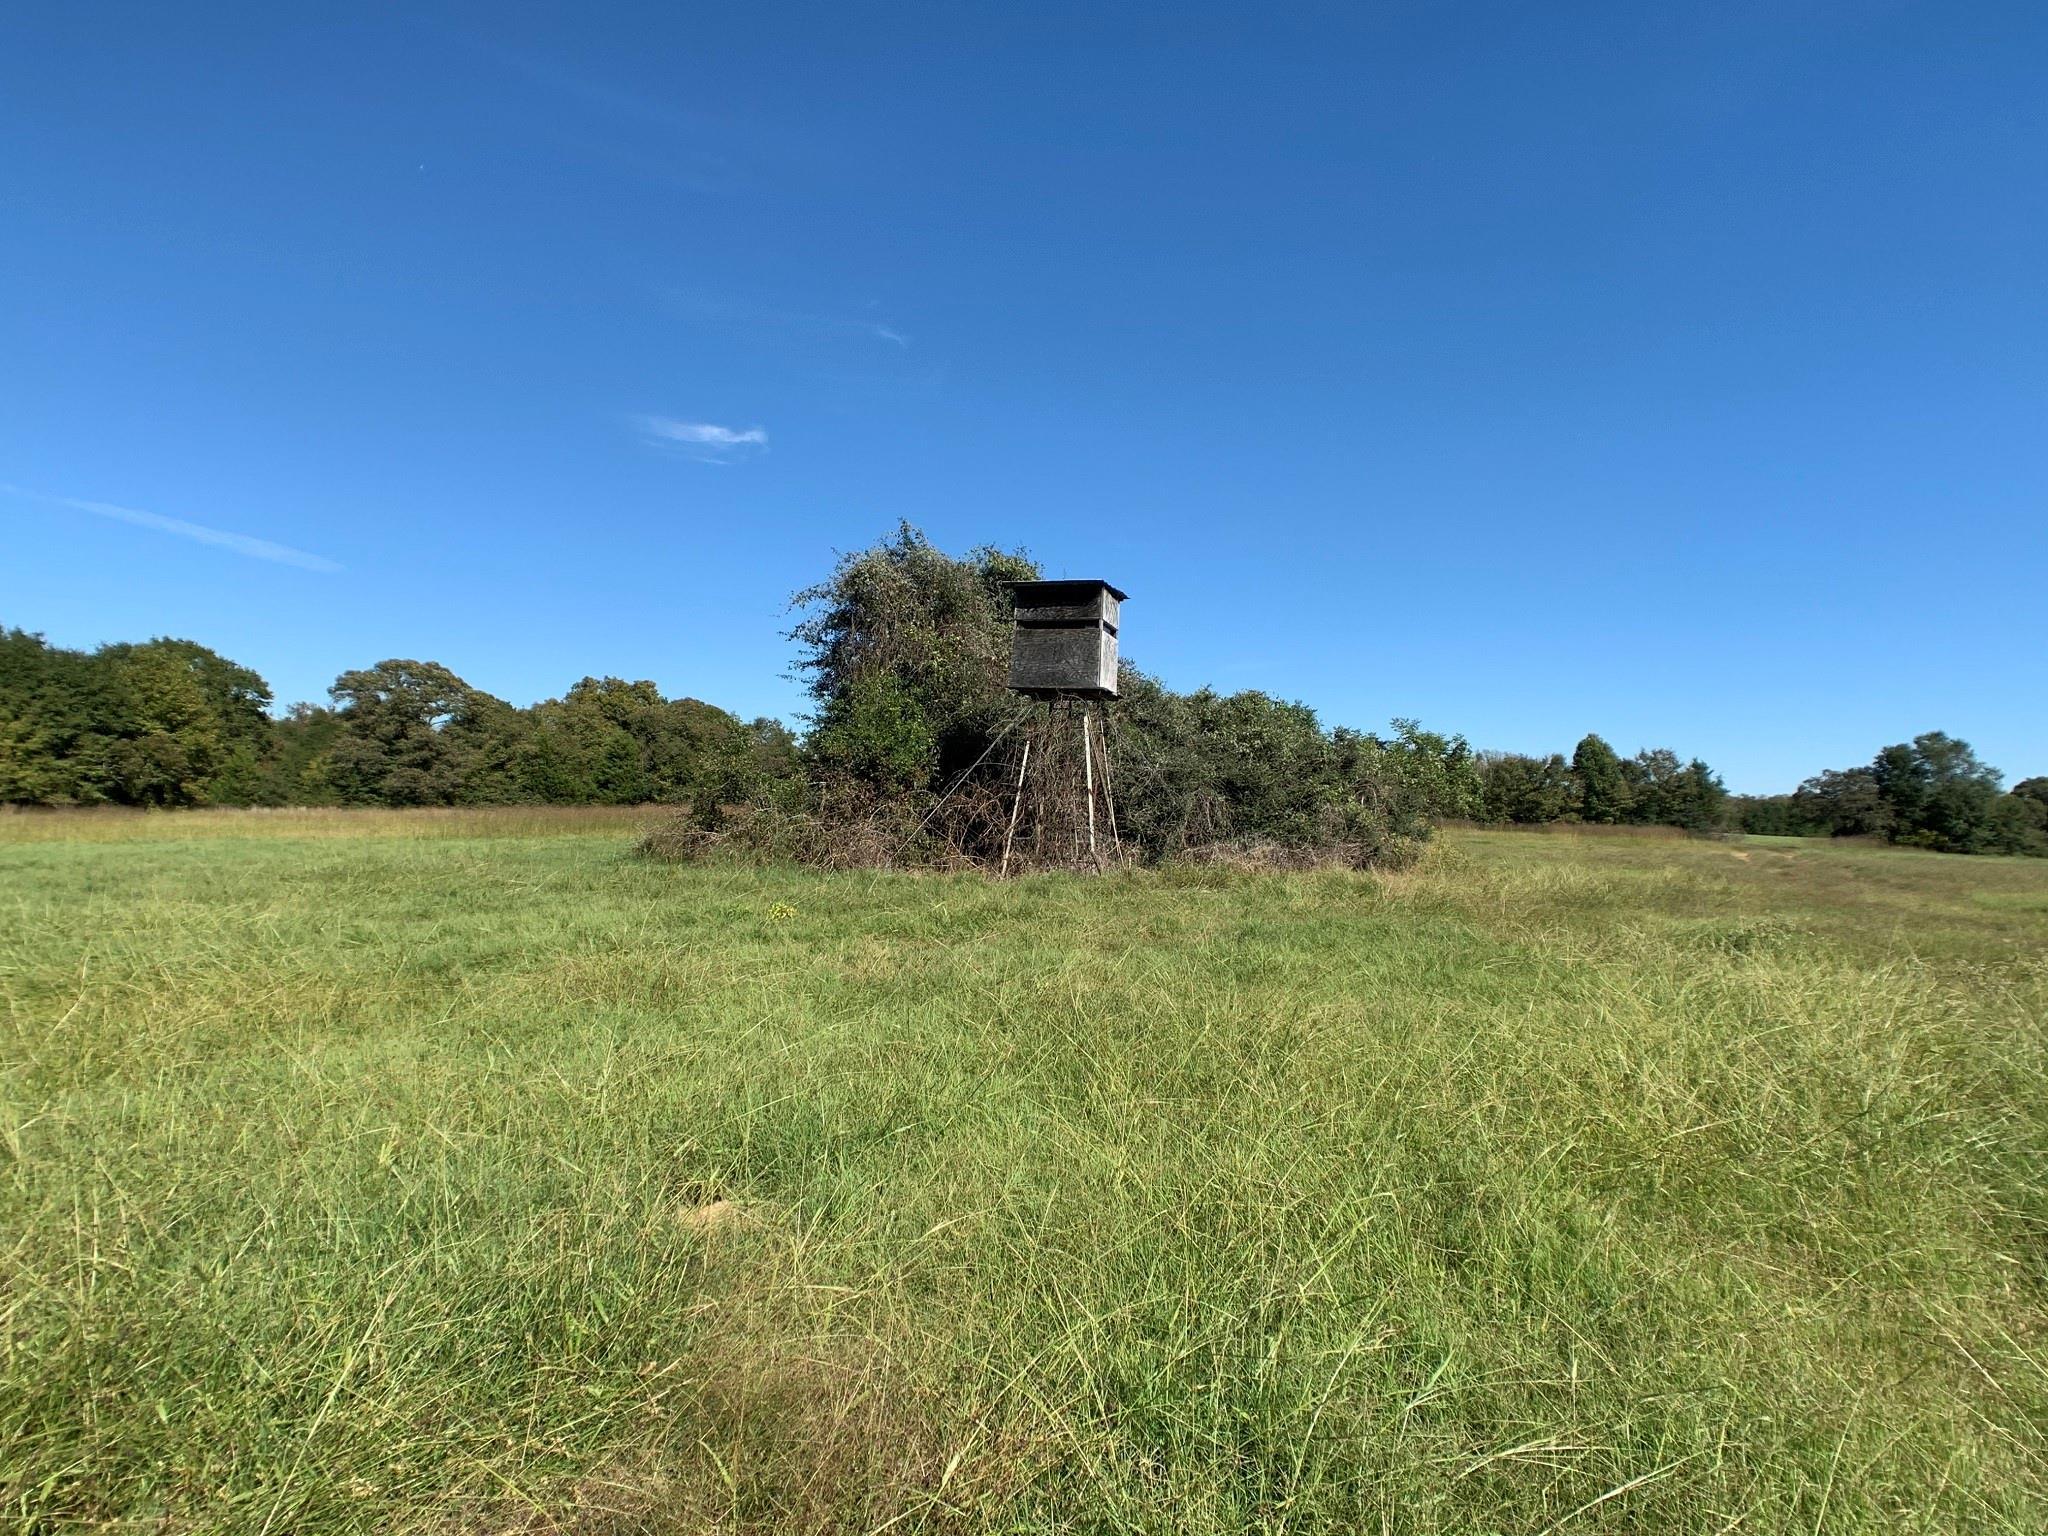 TBD Lot 3 HWY 75 S Property Photo - Buffalo, TX real estate listing